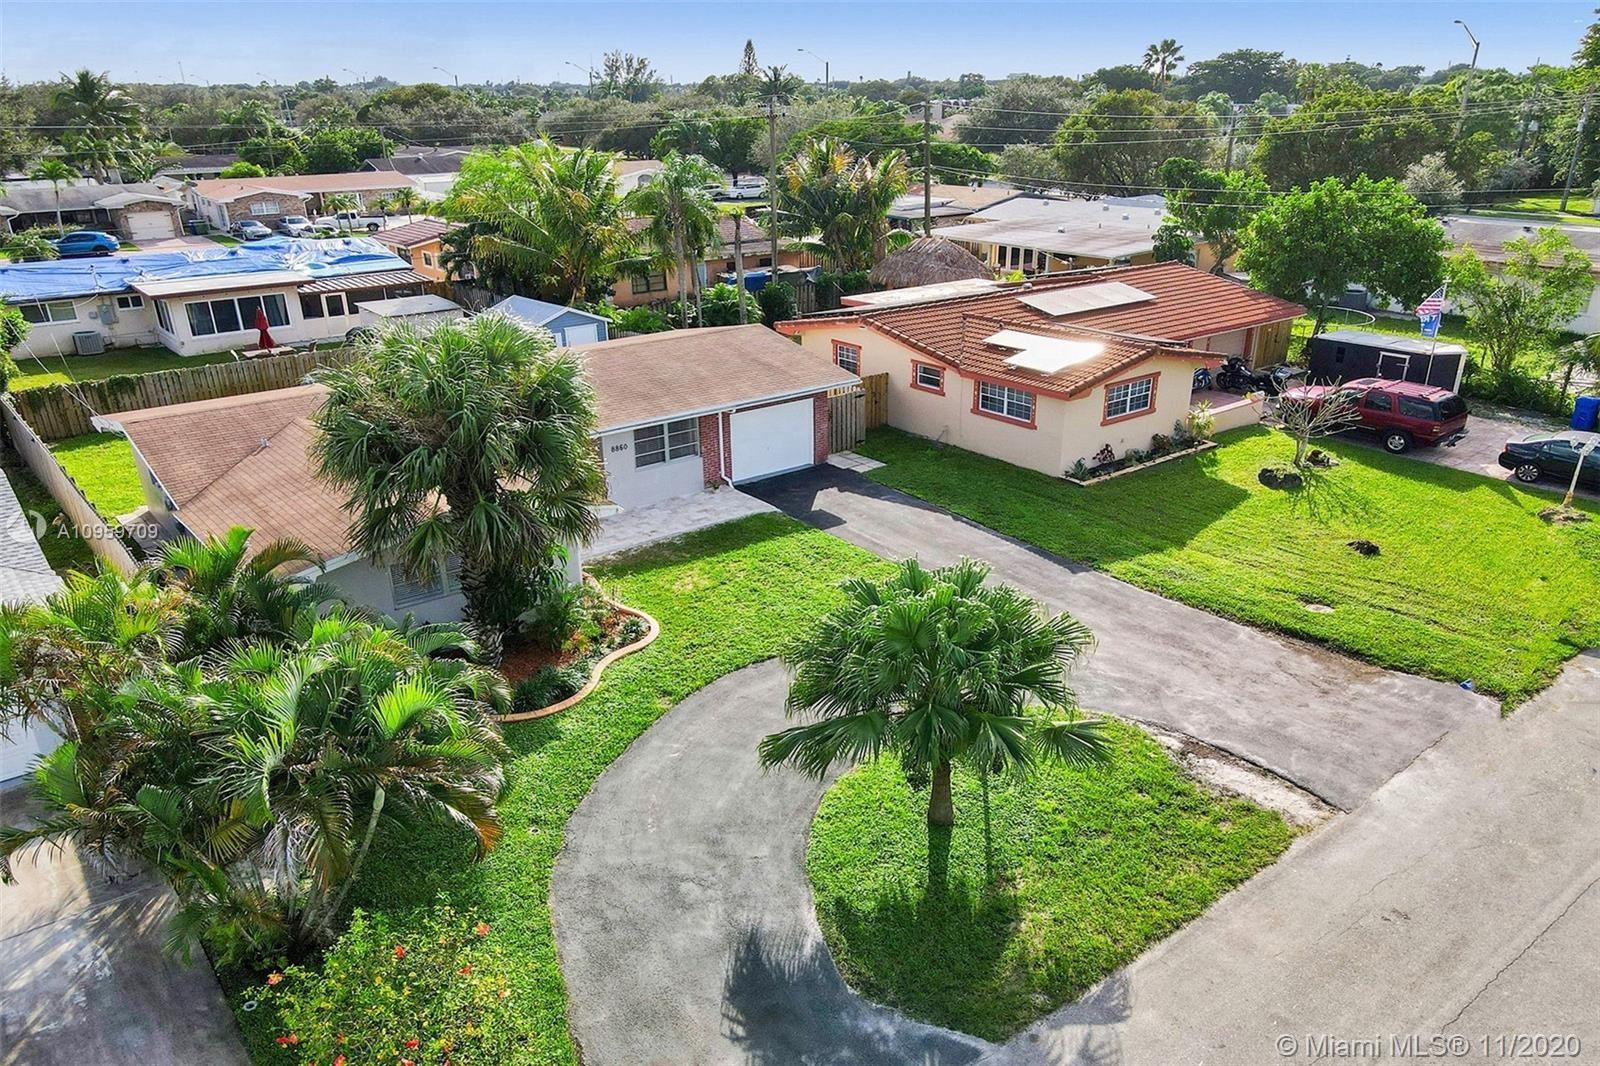 Photo of 8860 NW 16th St, Pembroke Pines, FL 33024 (MLS # A10959709)